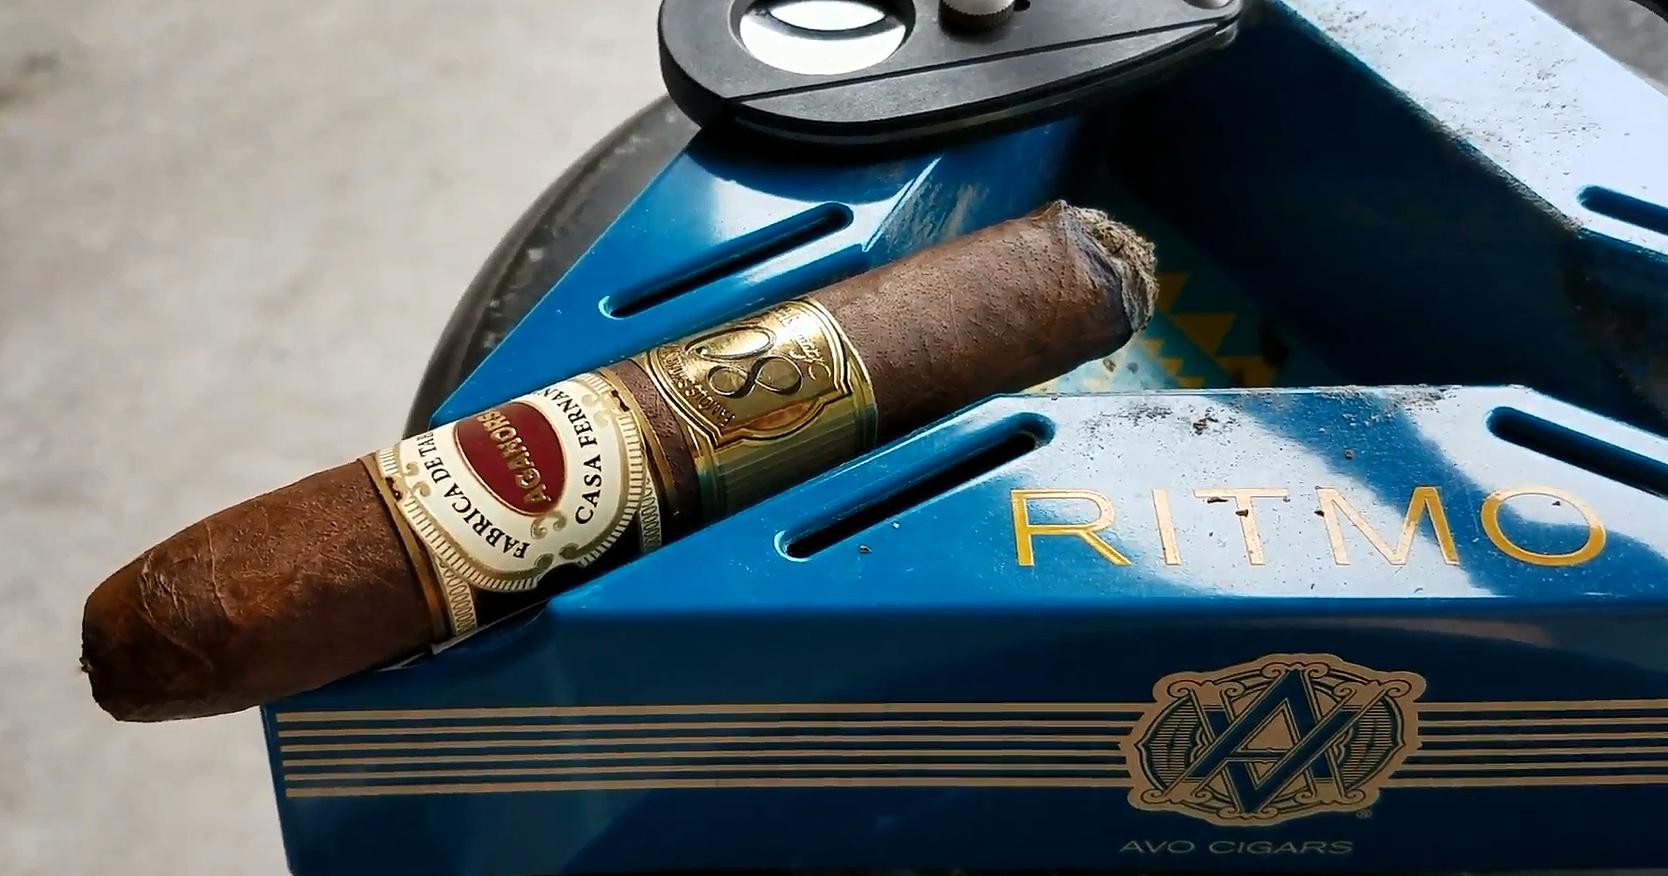 nowsmoking Aganorsa Leaf Famous Smoke Shop 80th Anniversary Toro cigar review by Gary Korb